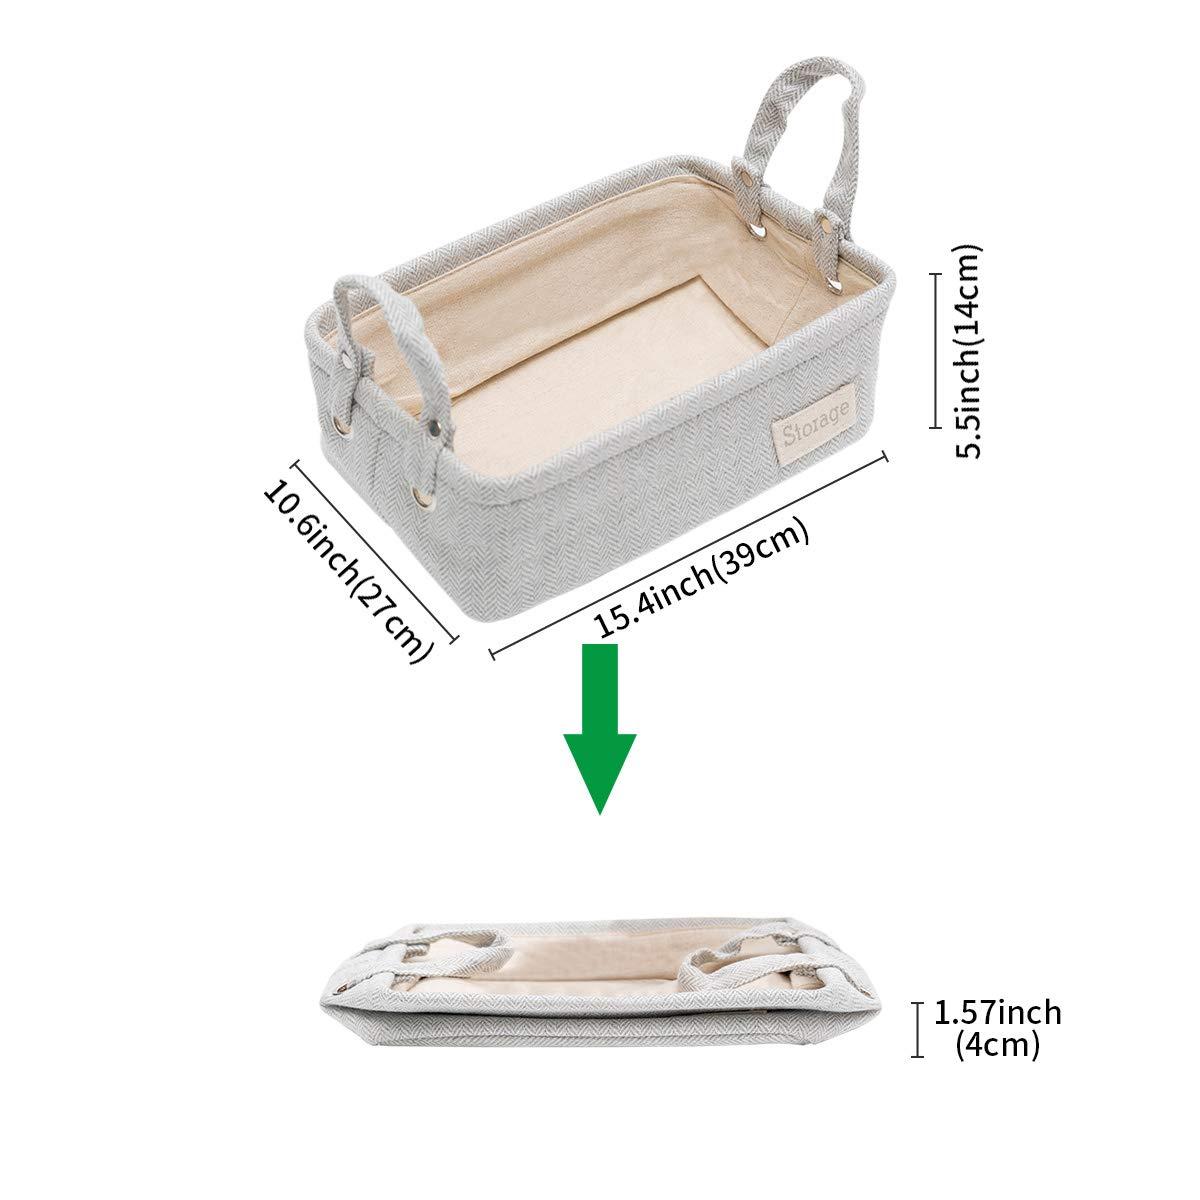 LUFOFOX/Storage Basket/Rectangular Collapsible Grey Storage Bin Organizer with Handle/for/Clothes/Storage,11.4x7.5x4 inches